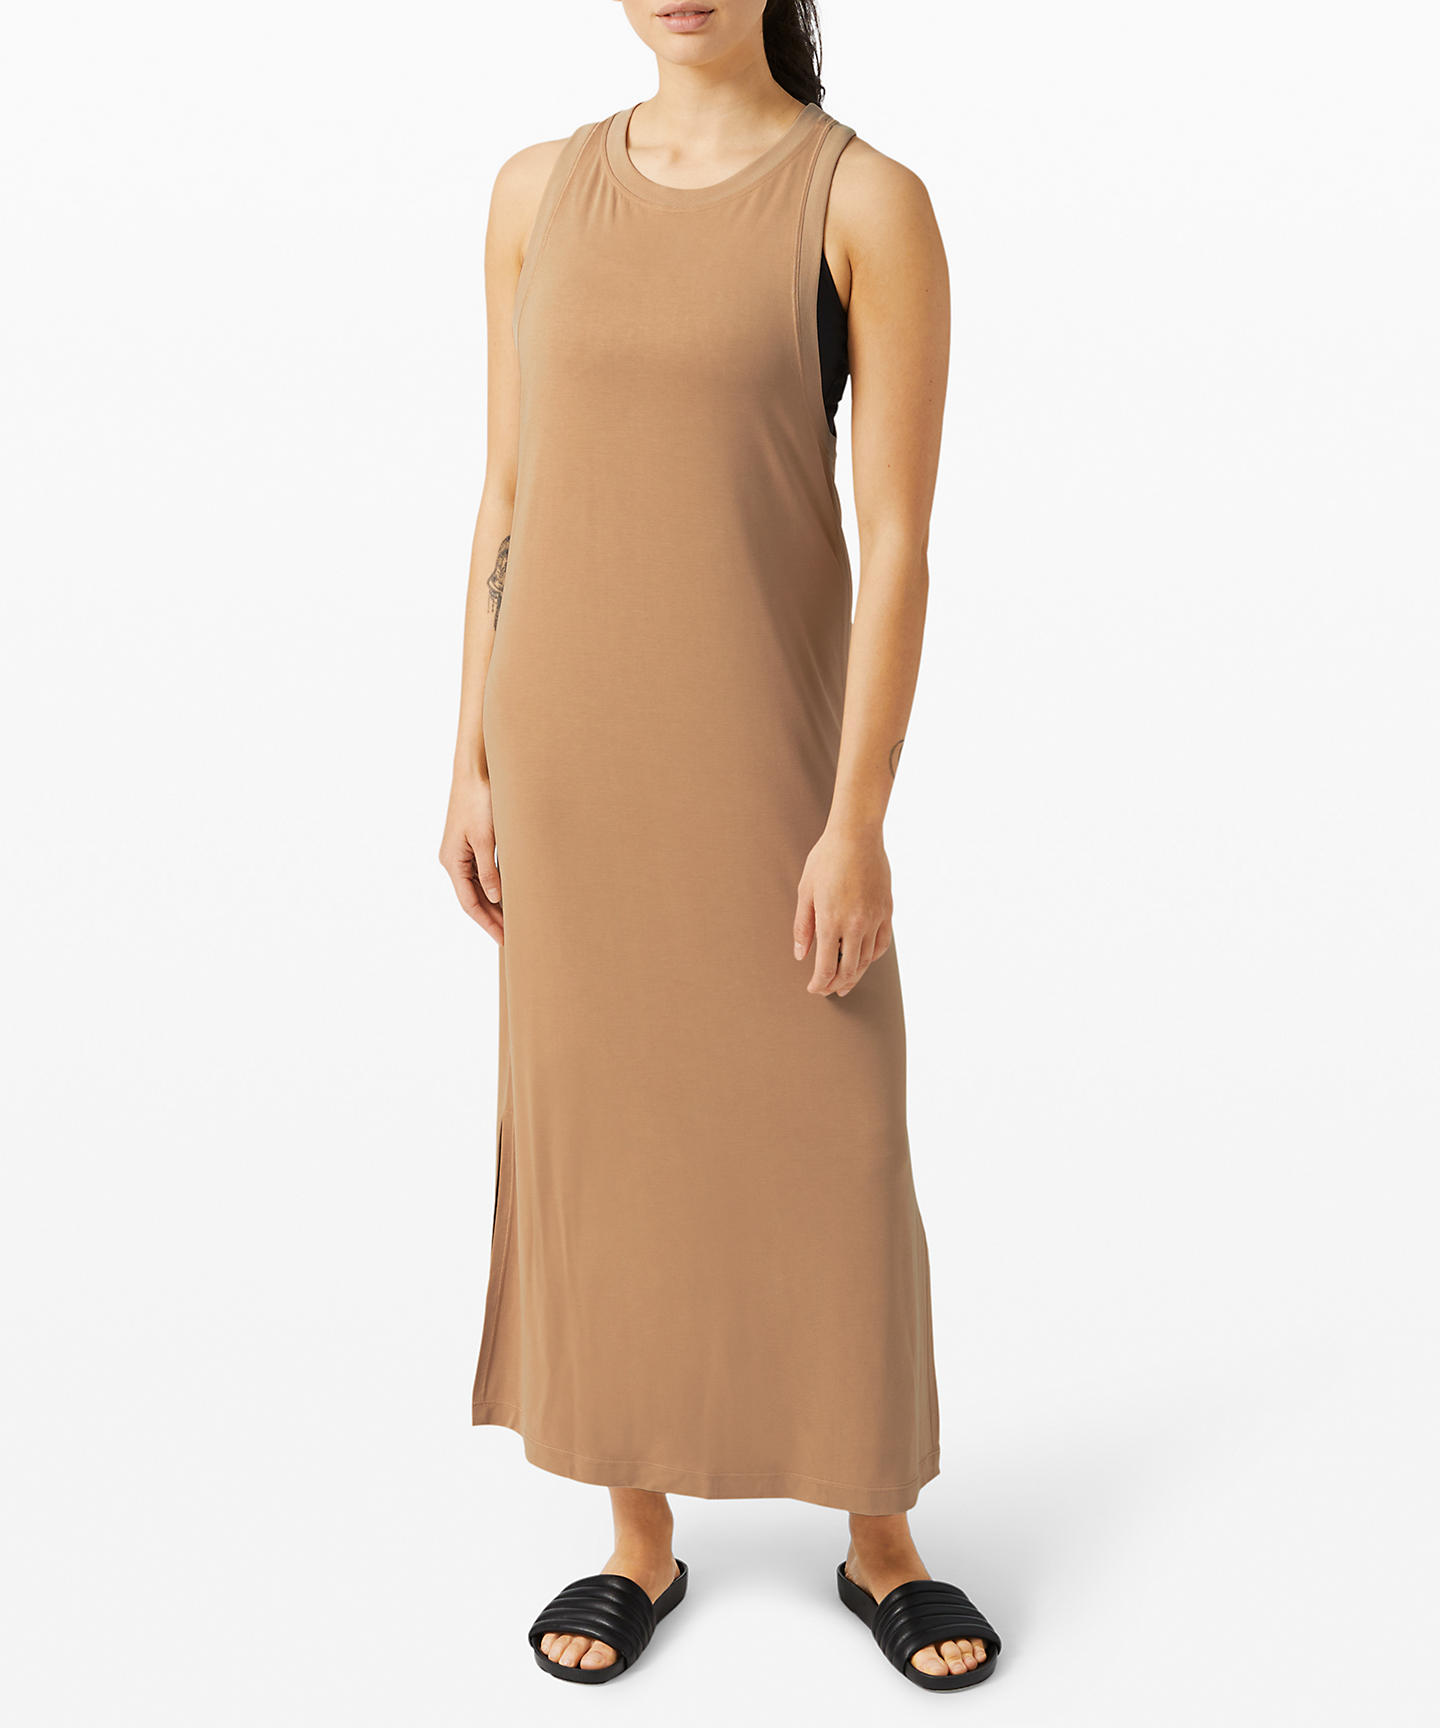 lululemon_ease of it all dress